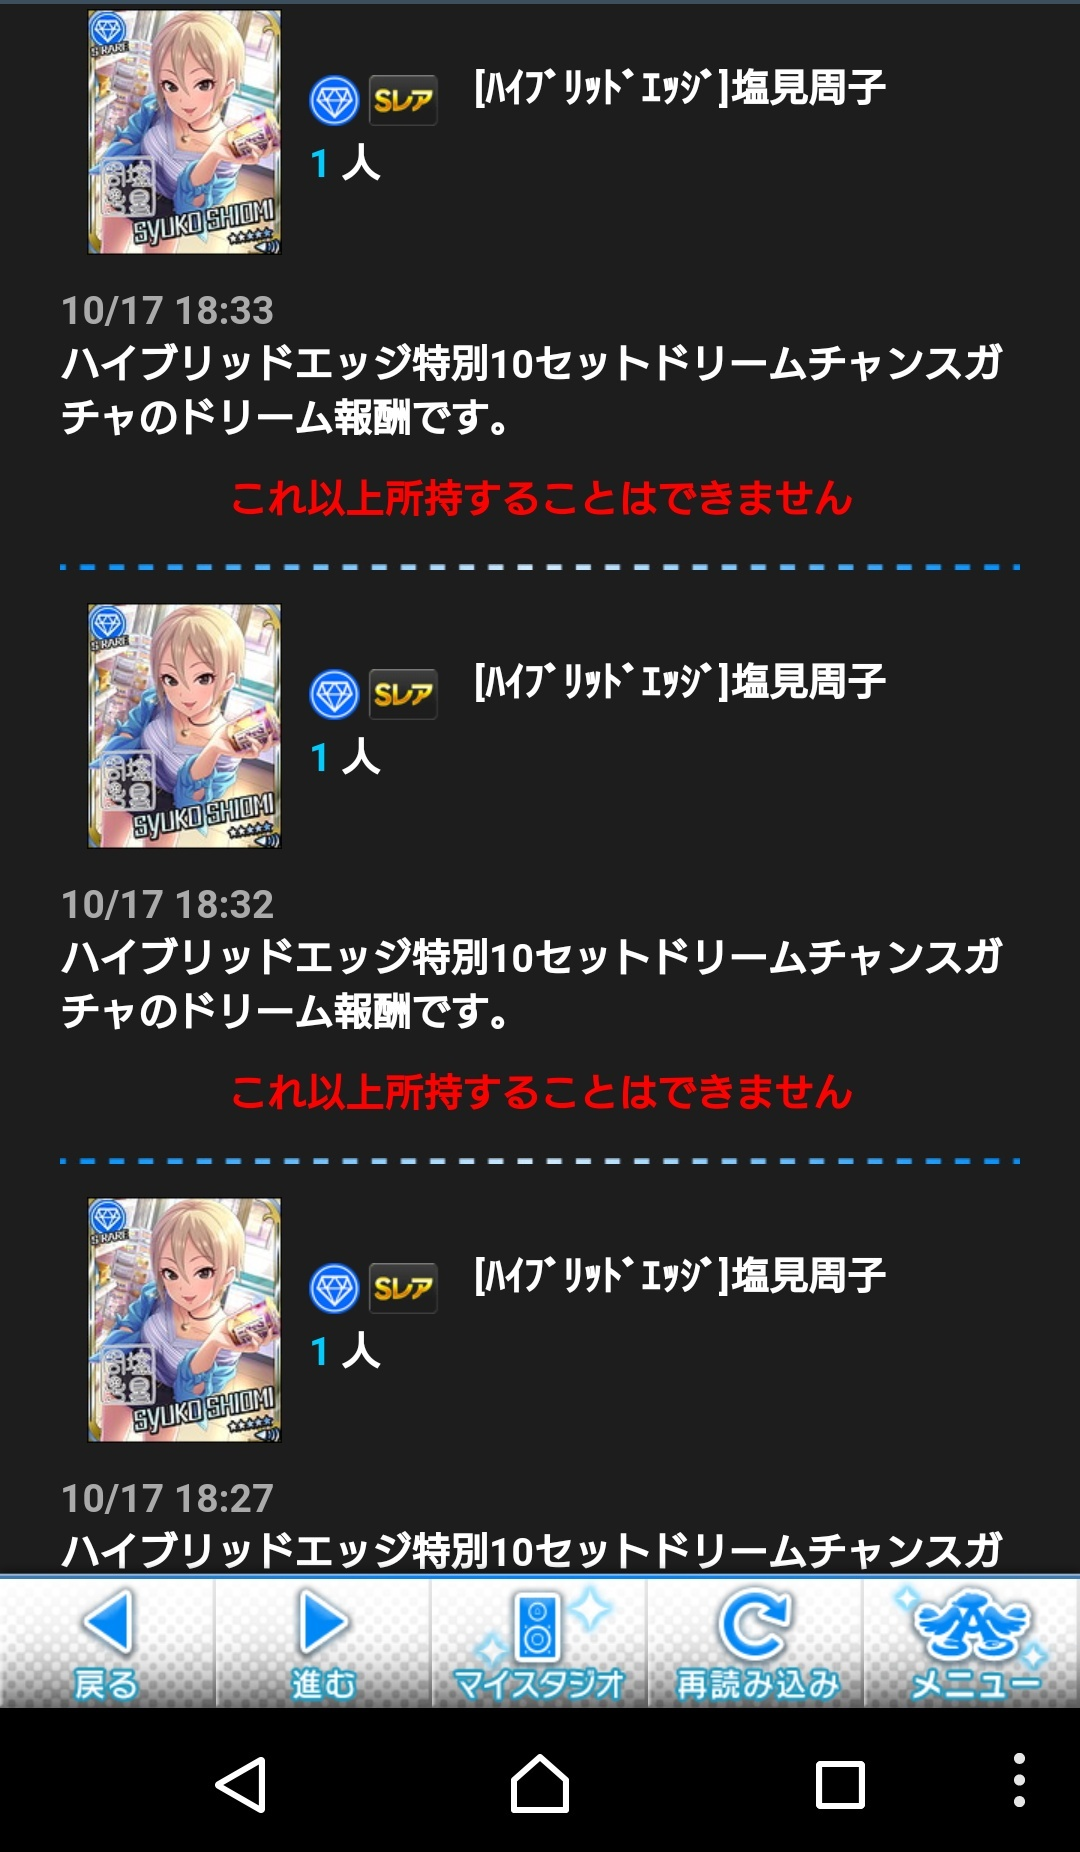 IMG_u7kh9e